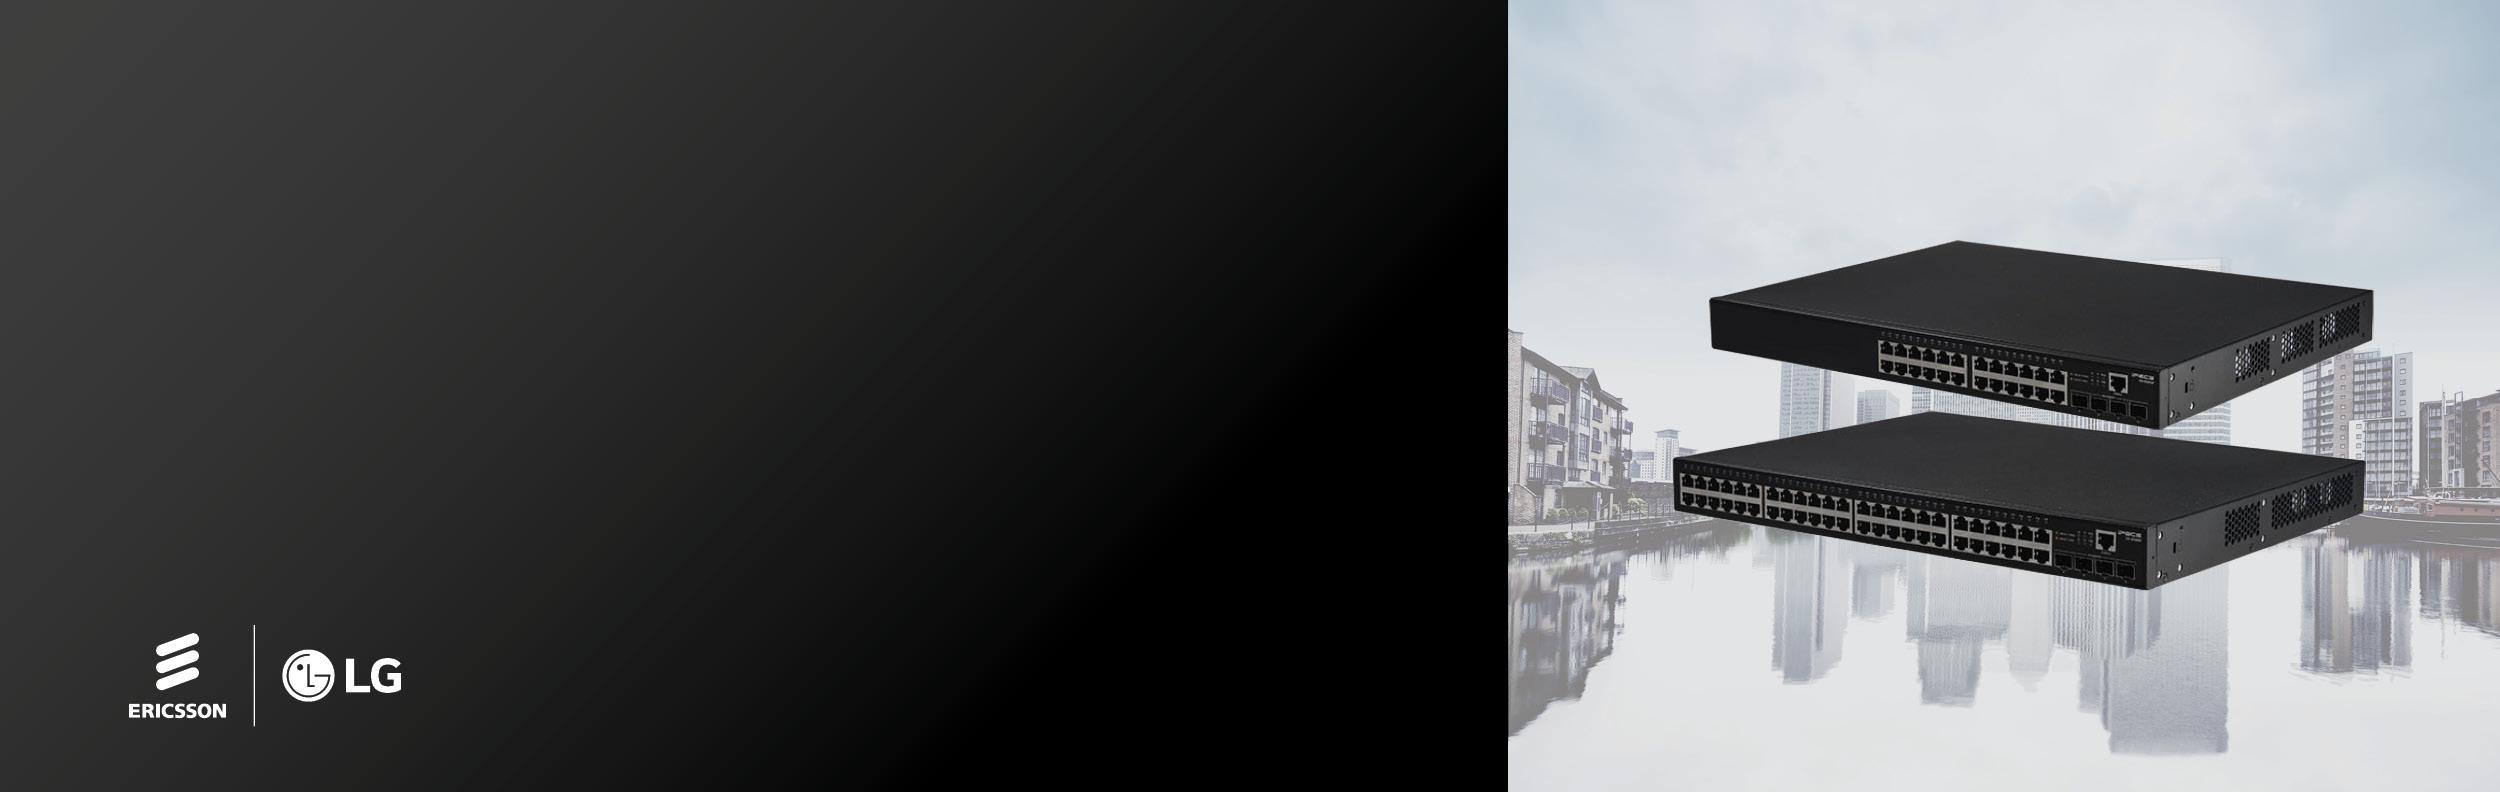 Ericsson-LG Network Switches